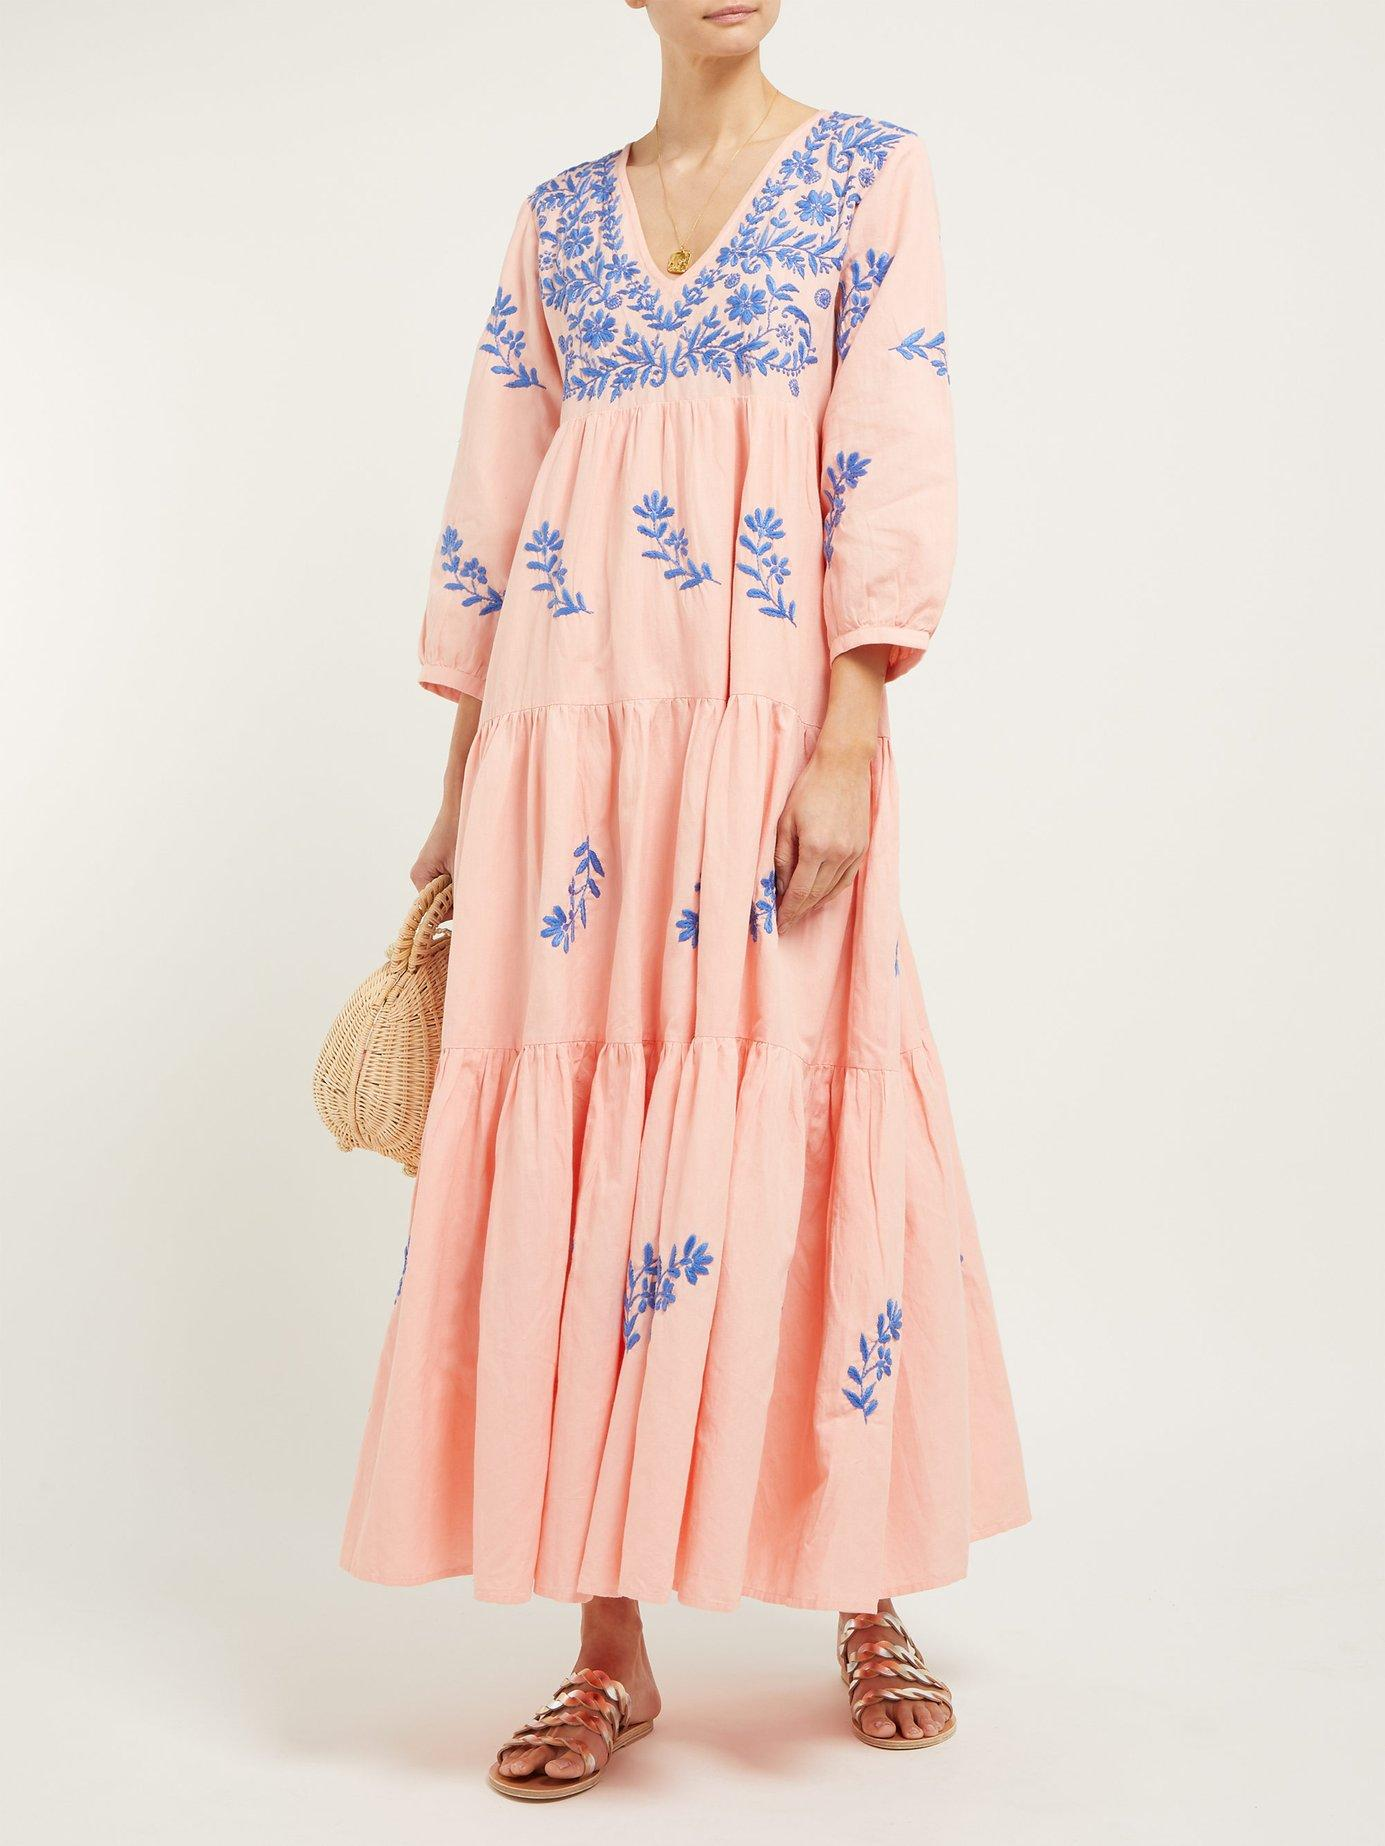 03d316e59db Lyst - Muzungu Sisters Frangipani Embroidered Cotton-blend Maxi Dress in  Pink - Save 19%